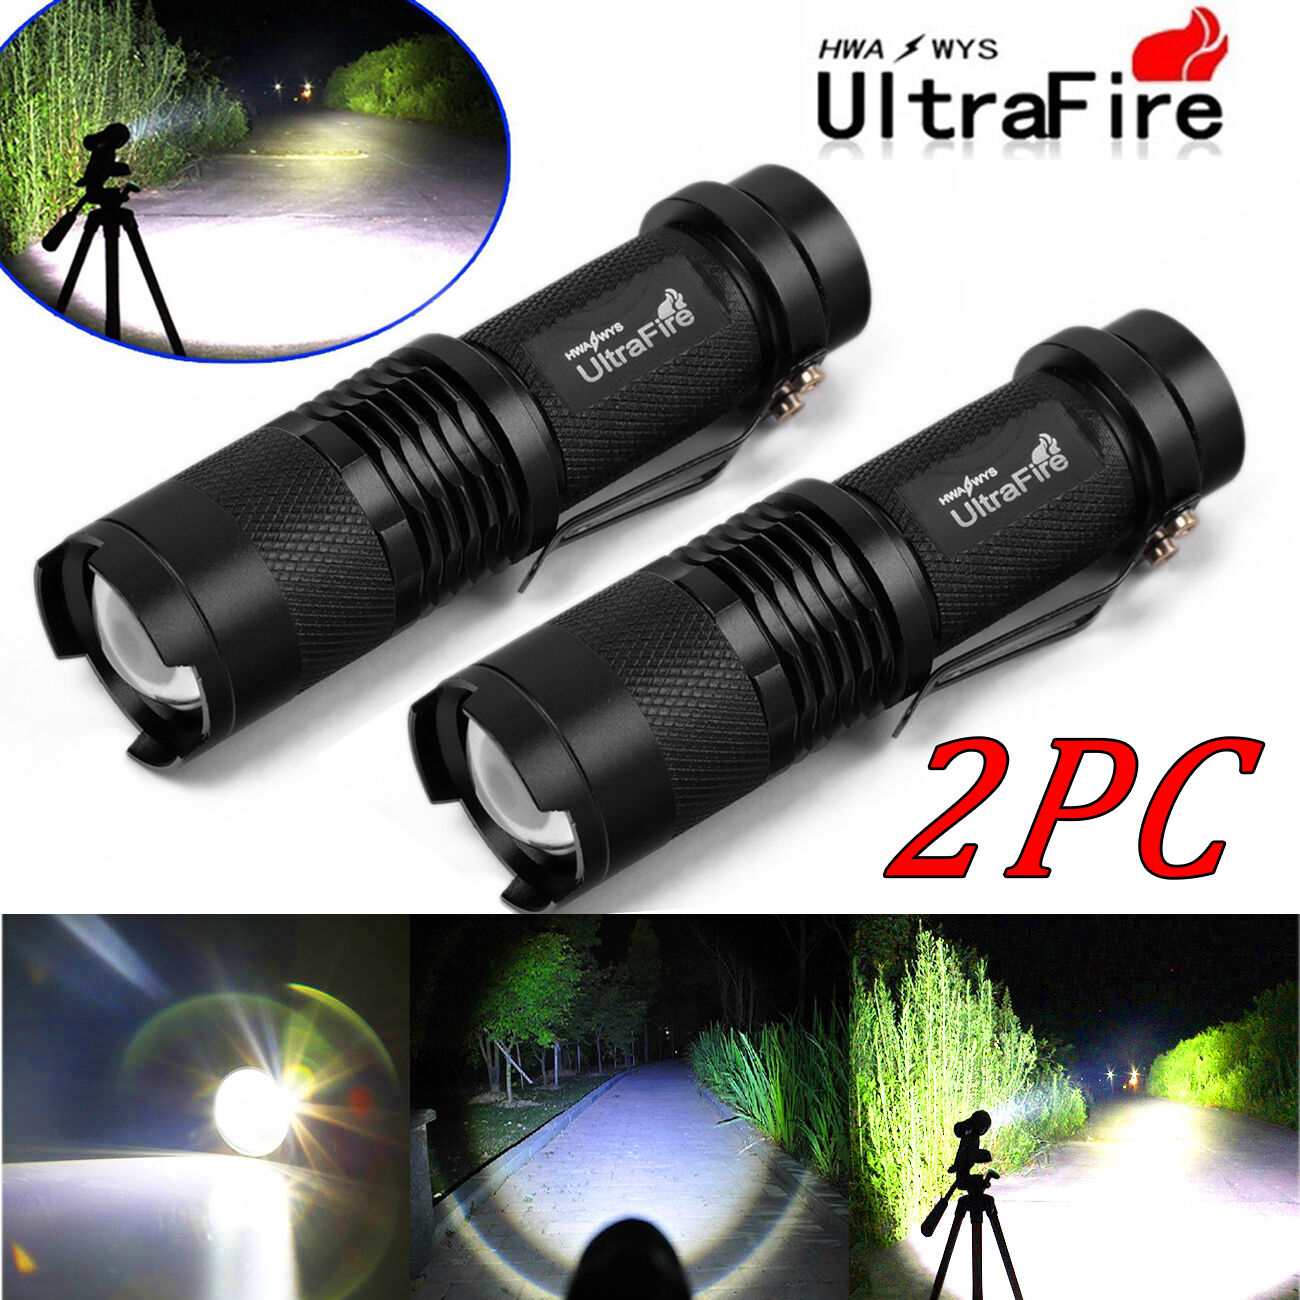 2PCS Ultrafire 8000Lumen CREE XM-L T6 LED Flashlight Torch Super Bright Light UP